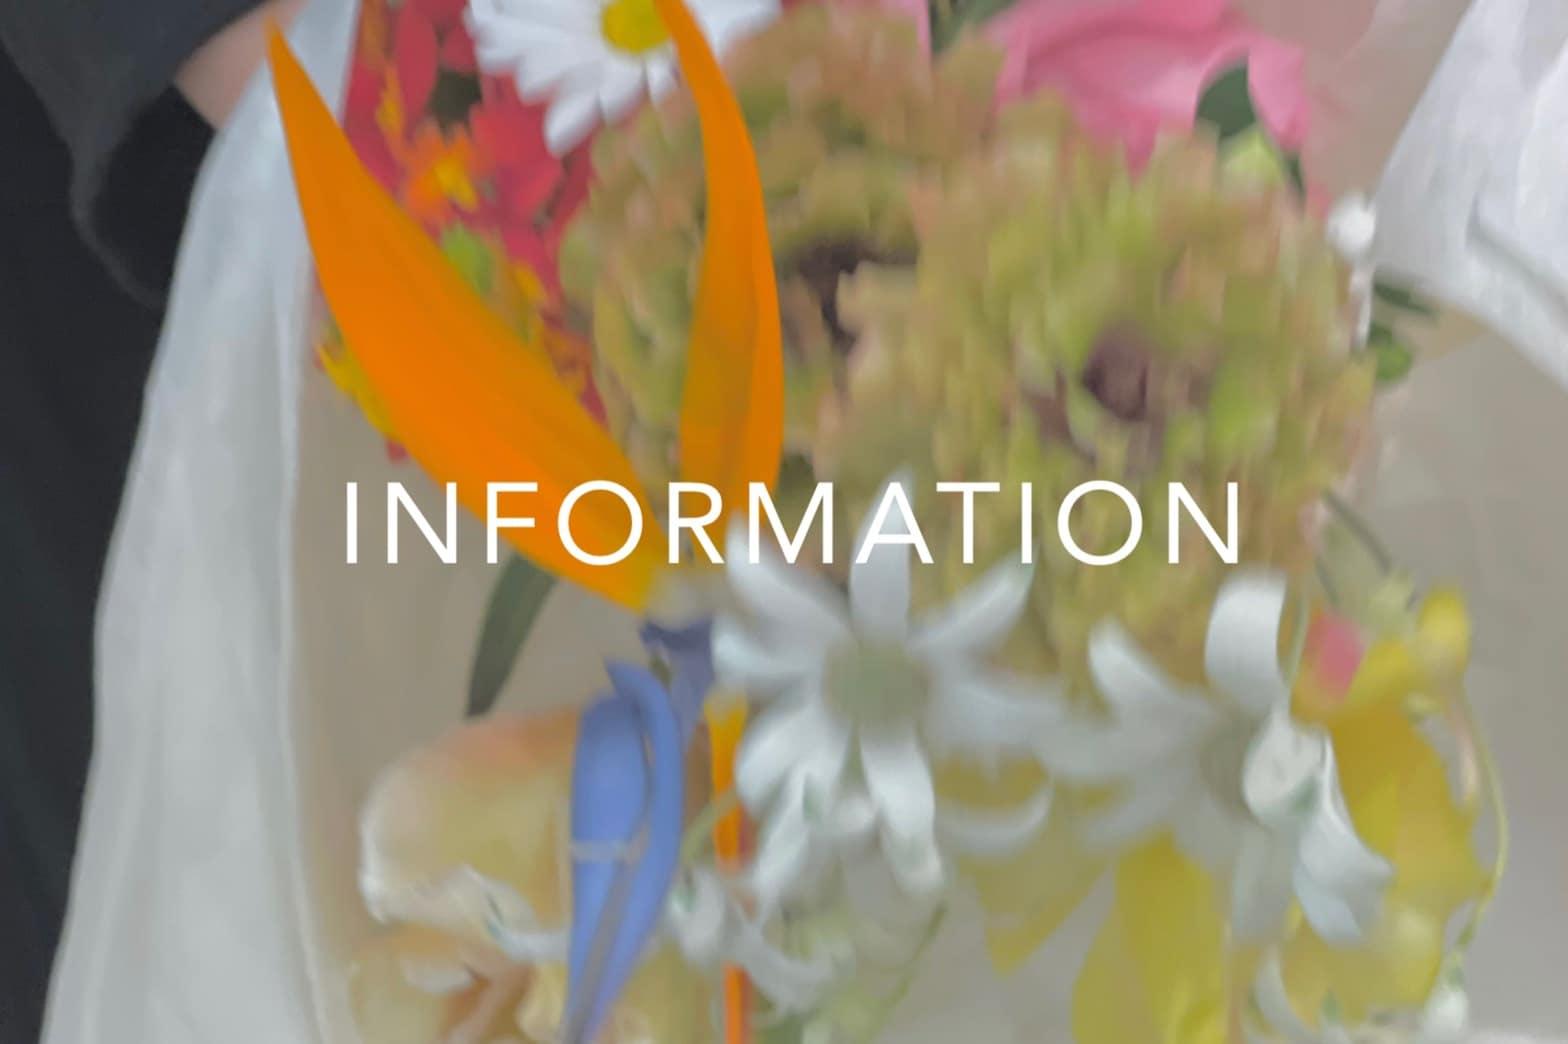 Discoat 【INFORMATION】店舗閉店のお知らせ